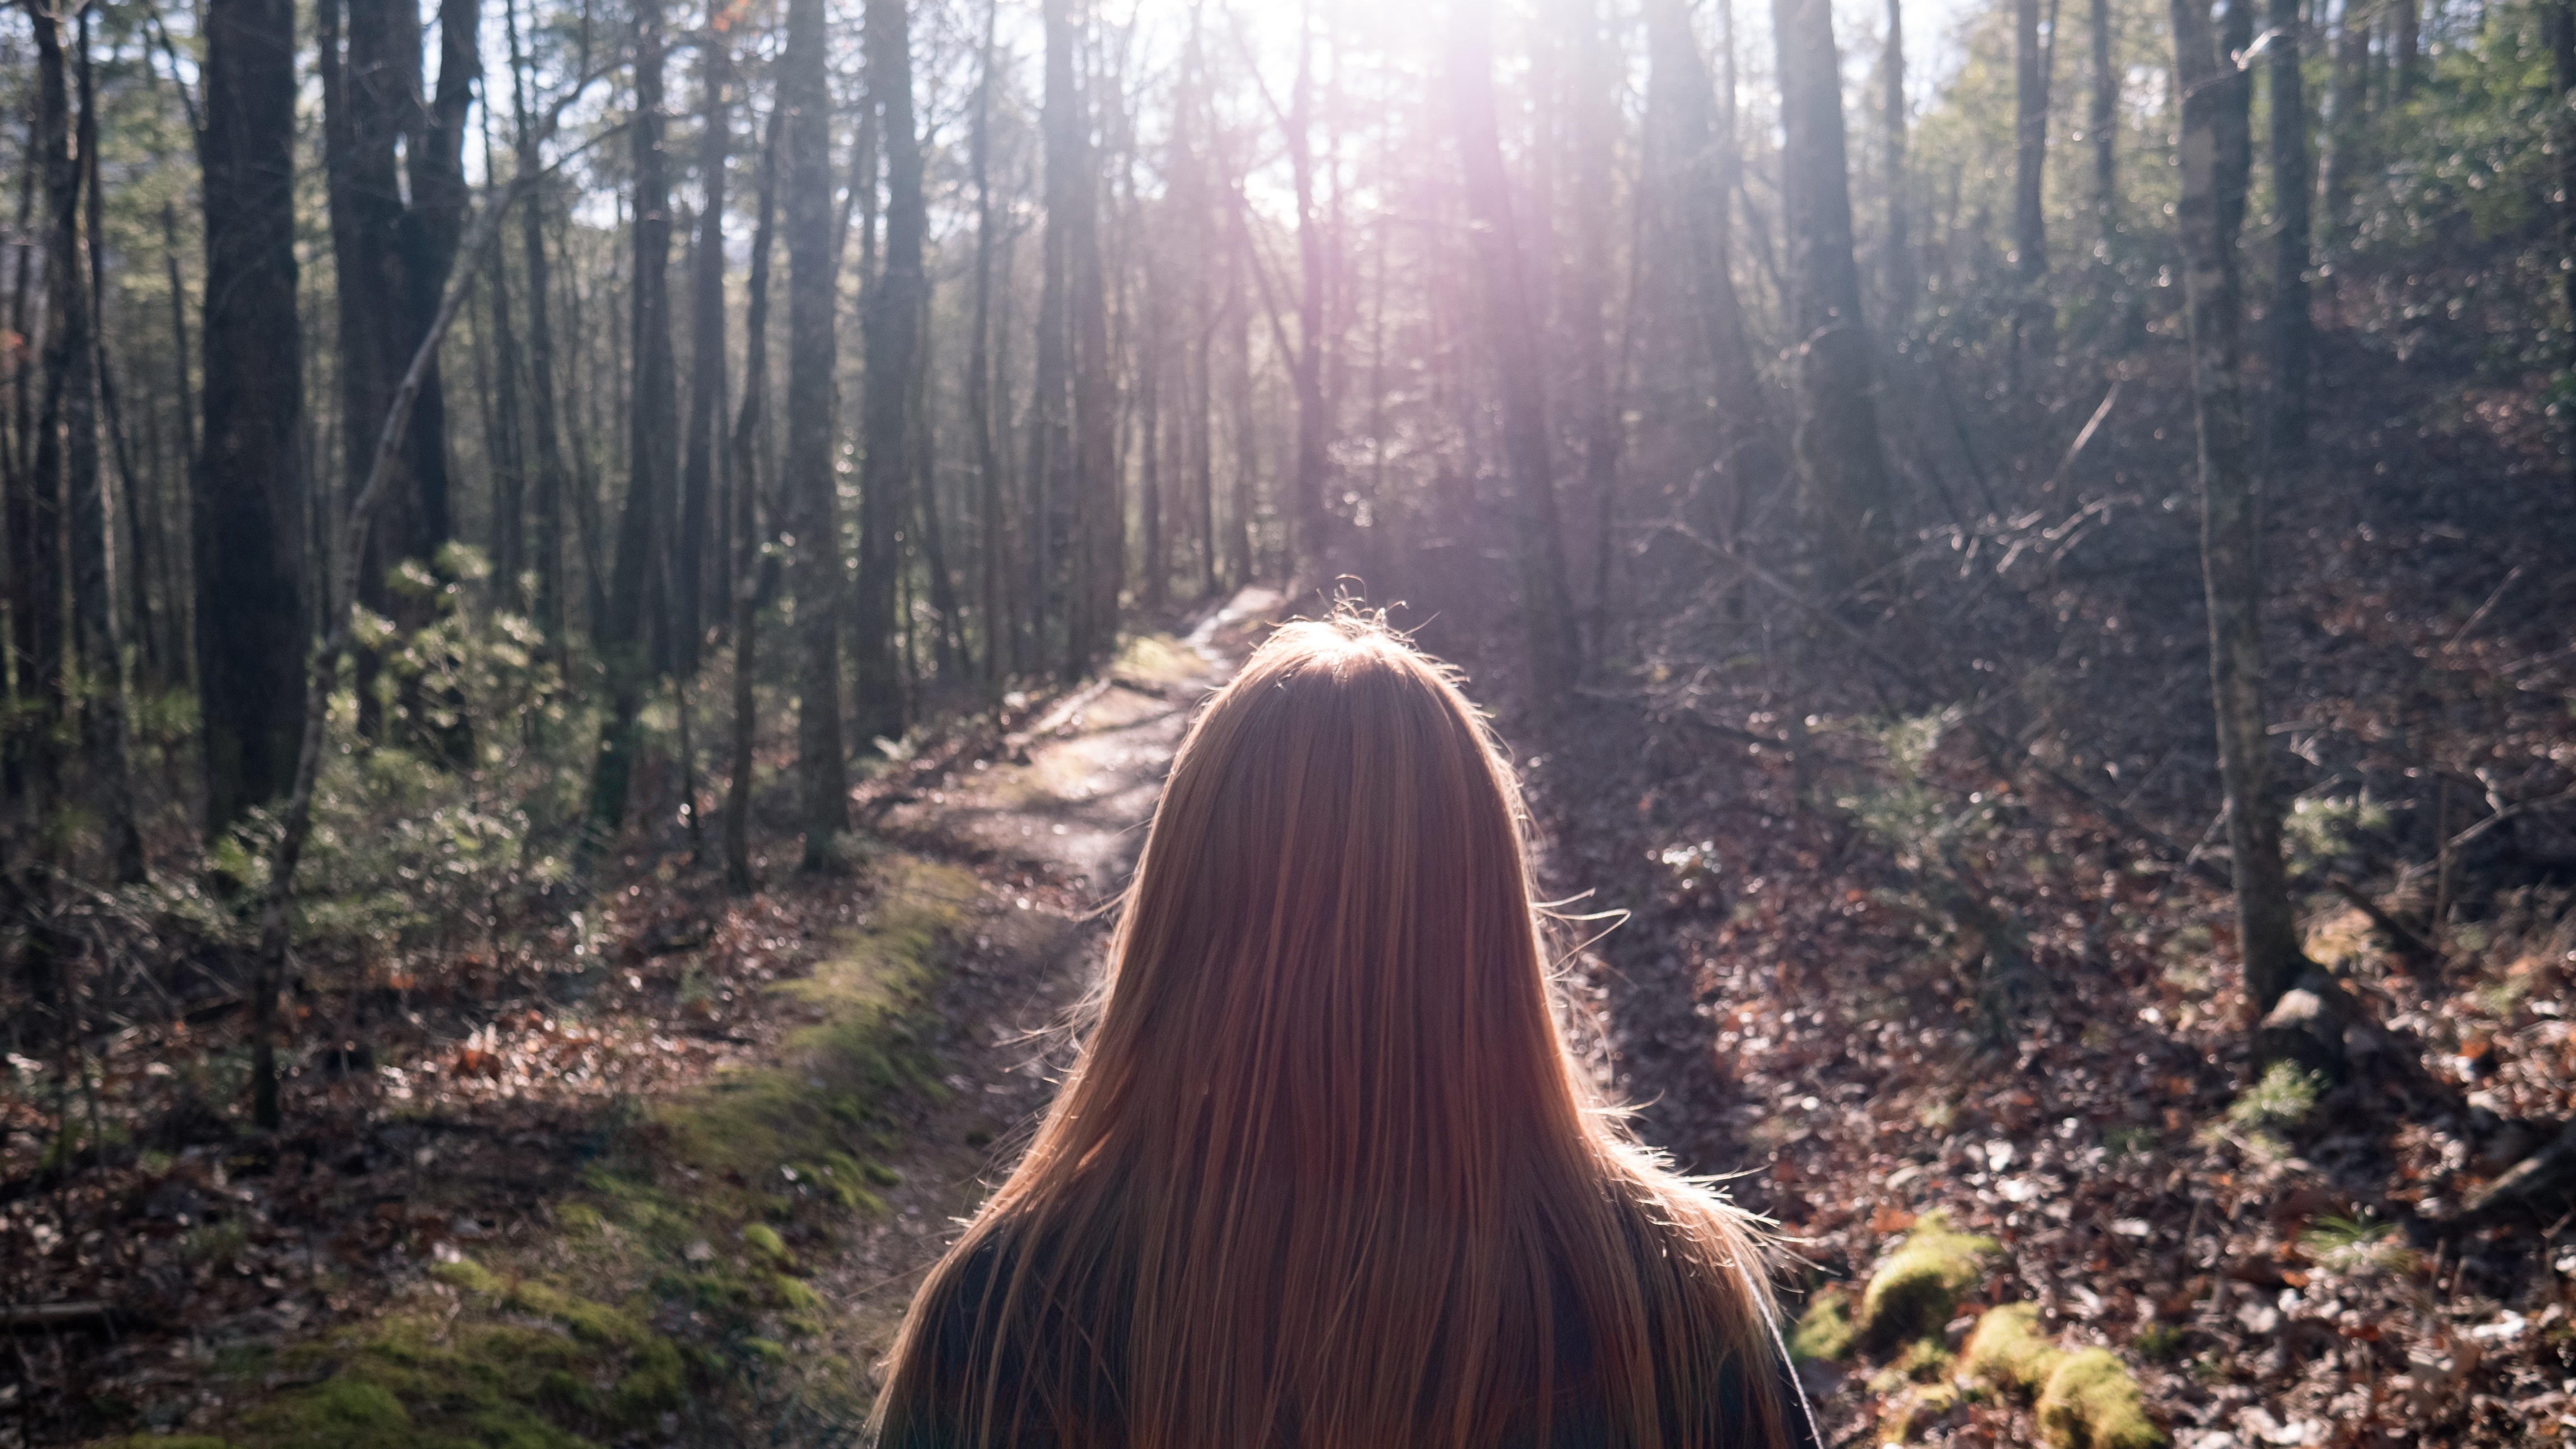 Woman in black top standing between trees photo